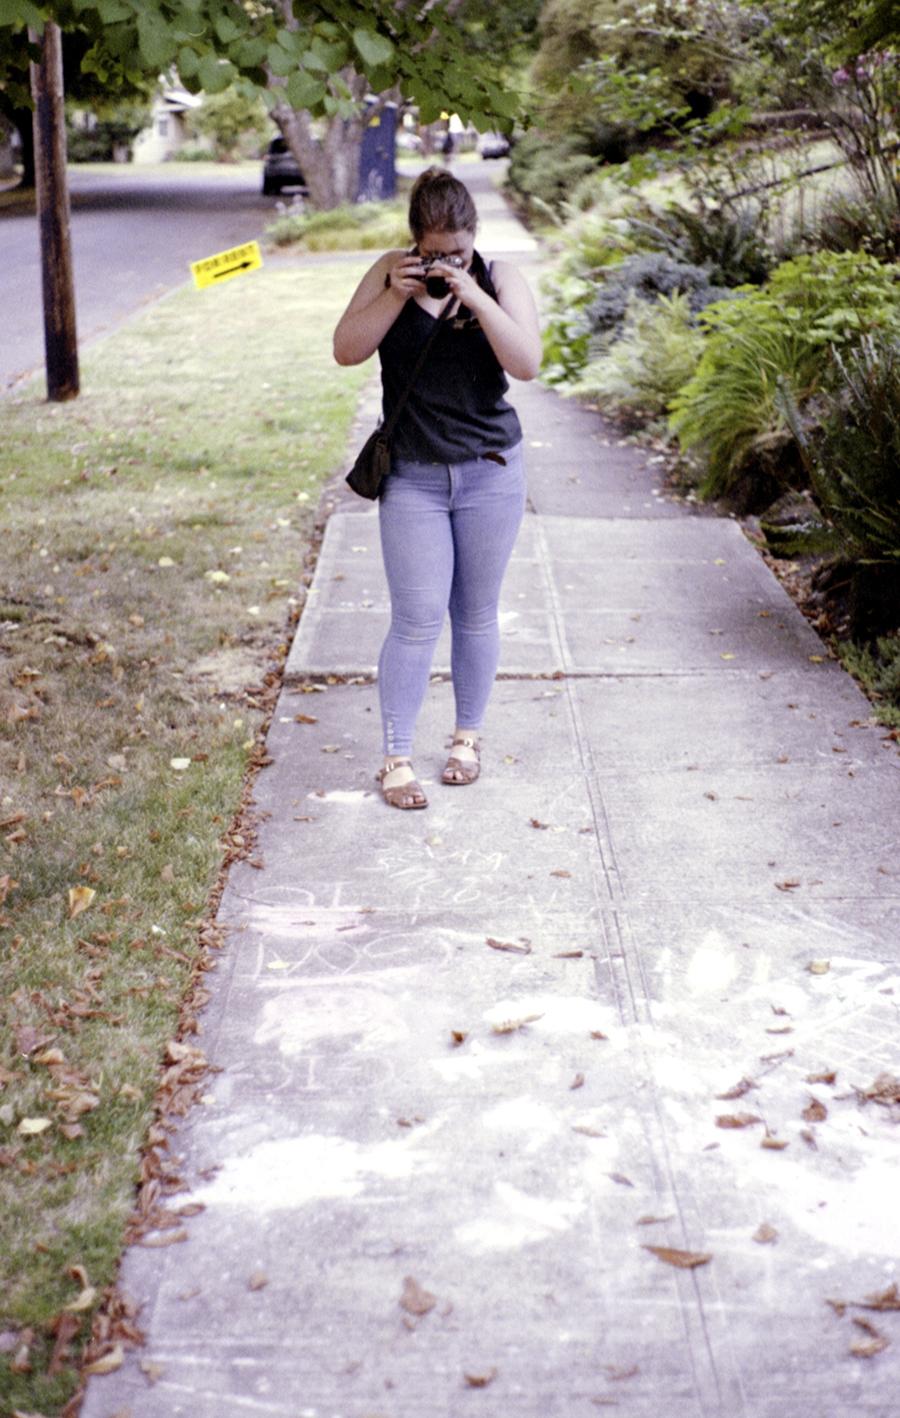 iris-sidewalk-july2019_mattschu.jpg